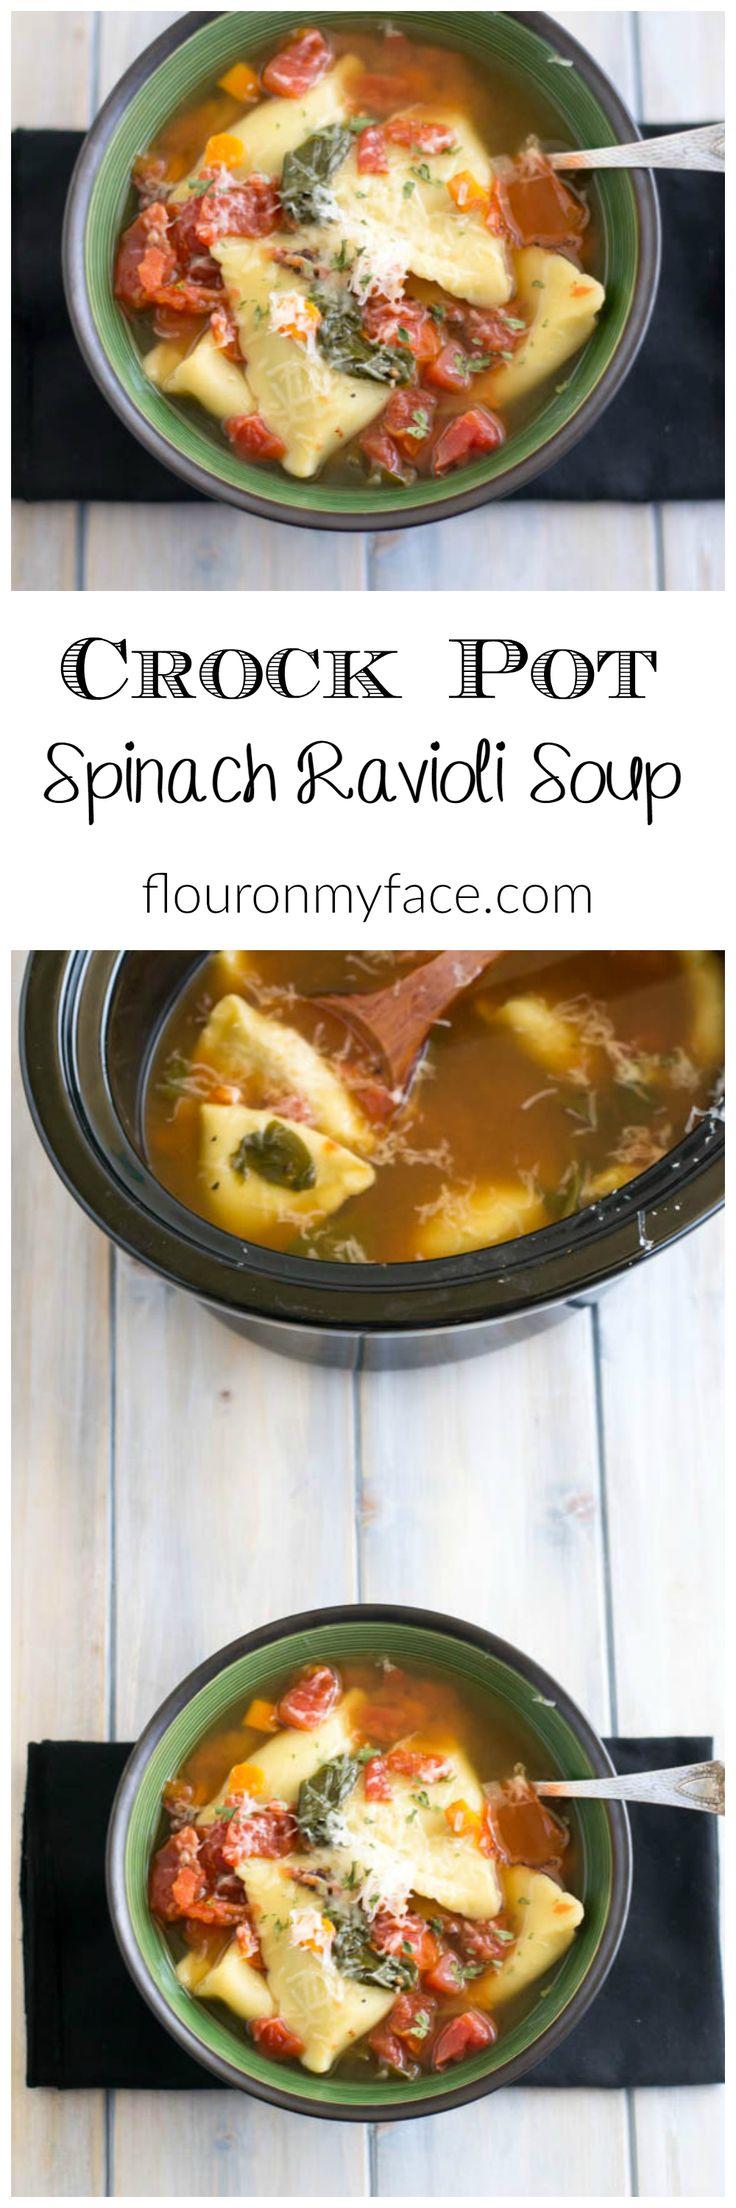 Crock Pot Slow Cooker Spinach Ravioli Soup recipe via flouronmyface.com